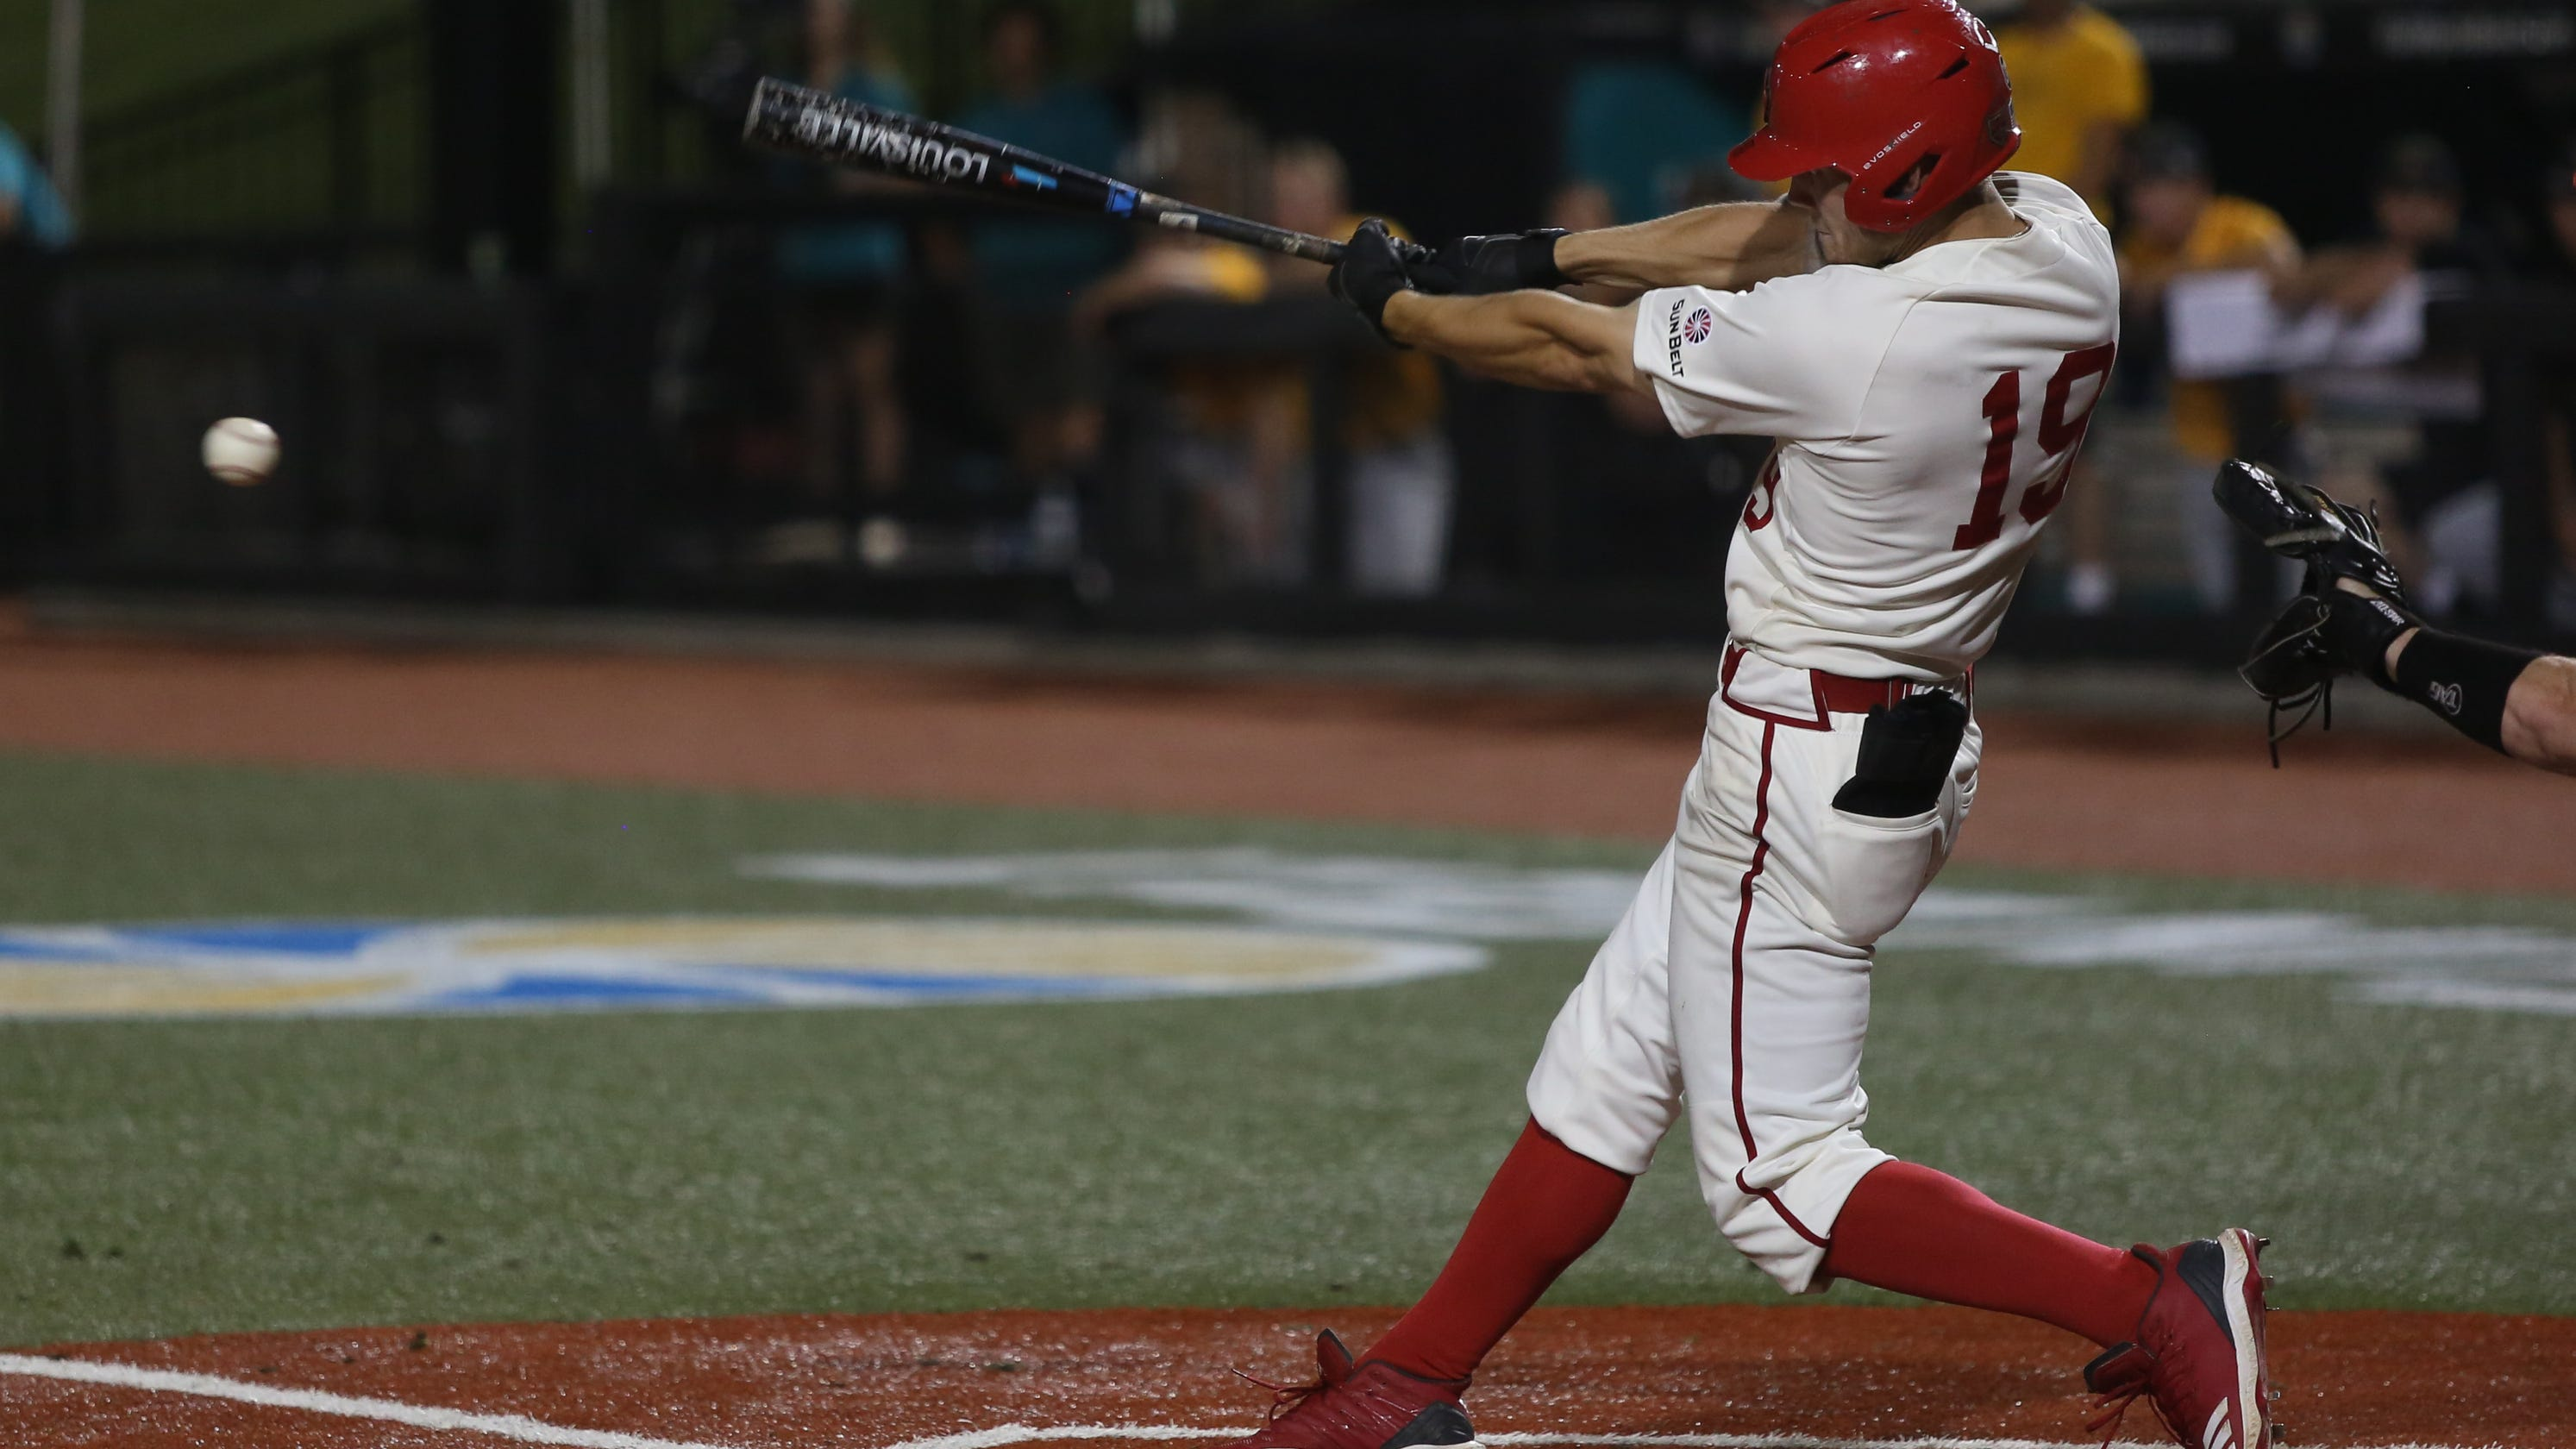 ULL Baseball: Kasuls Comes Through To Extend Cajuns' Run